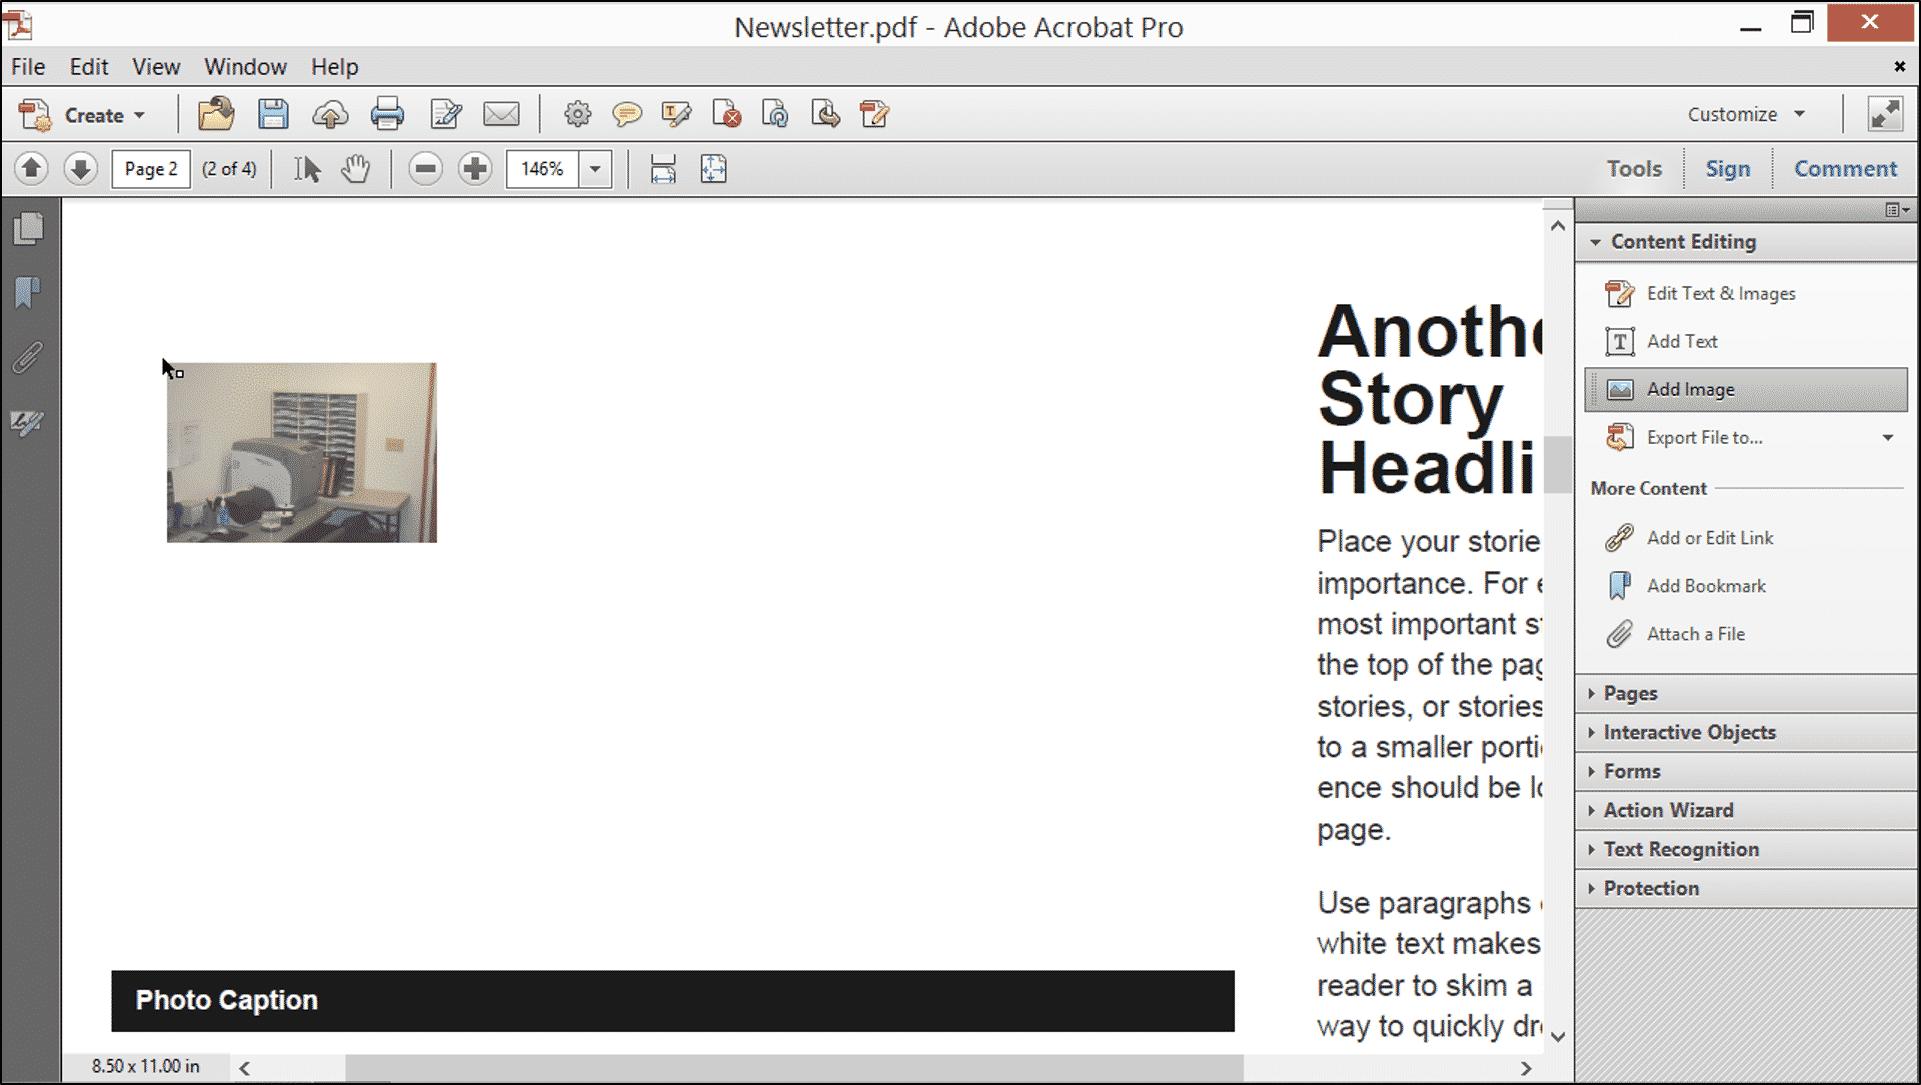 Pro tools first tutorial pdf